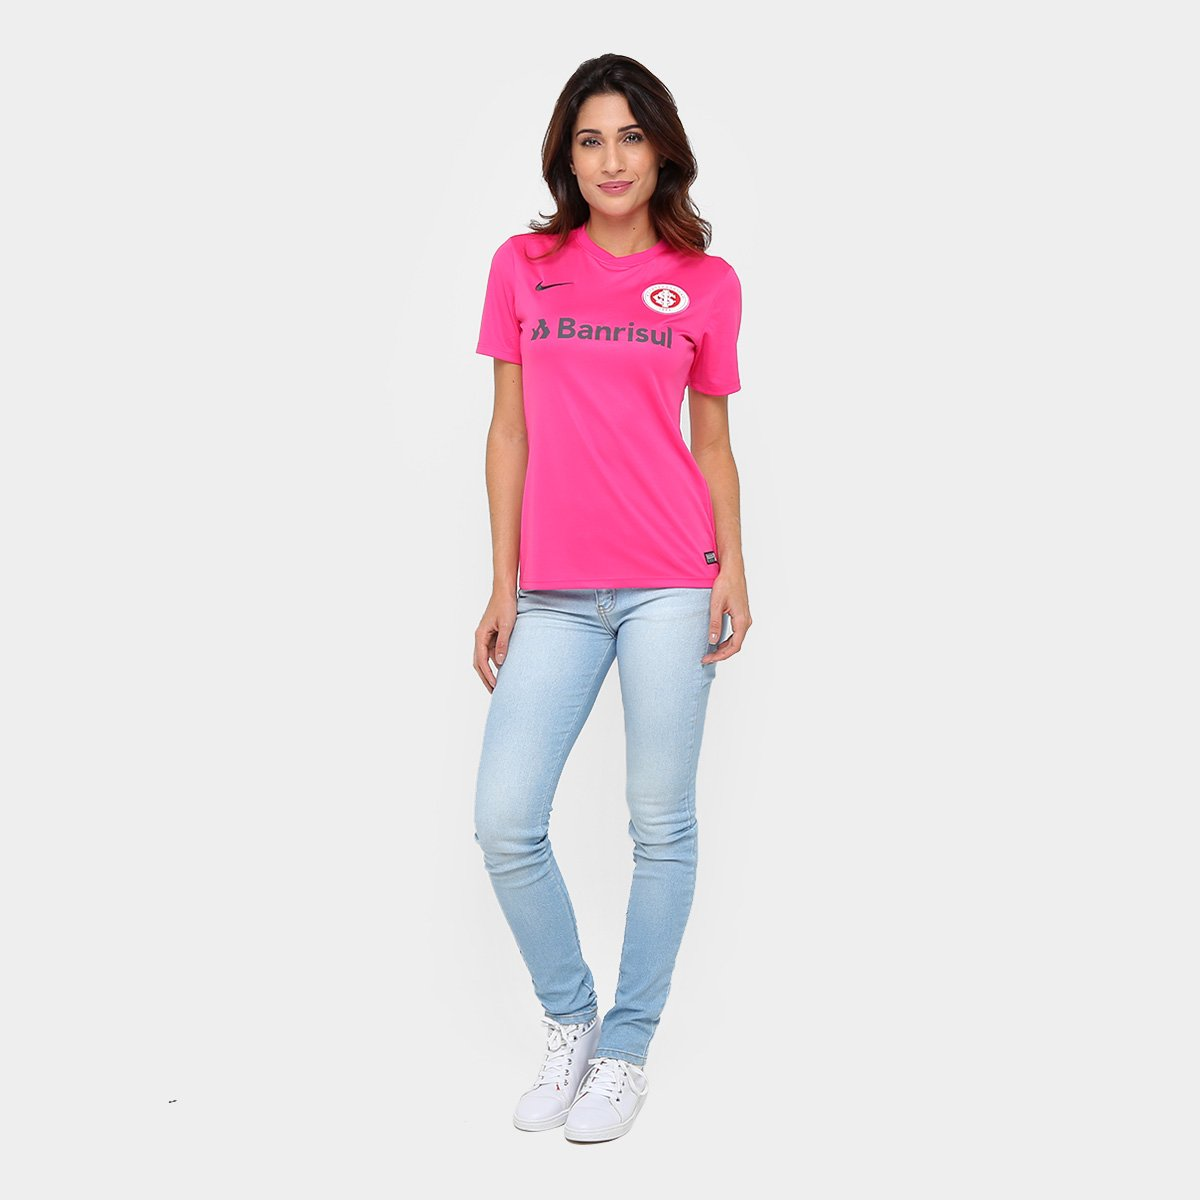 Camisa Internacional Nike Feminina